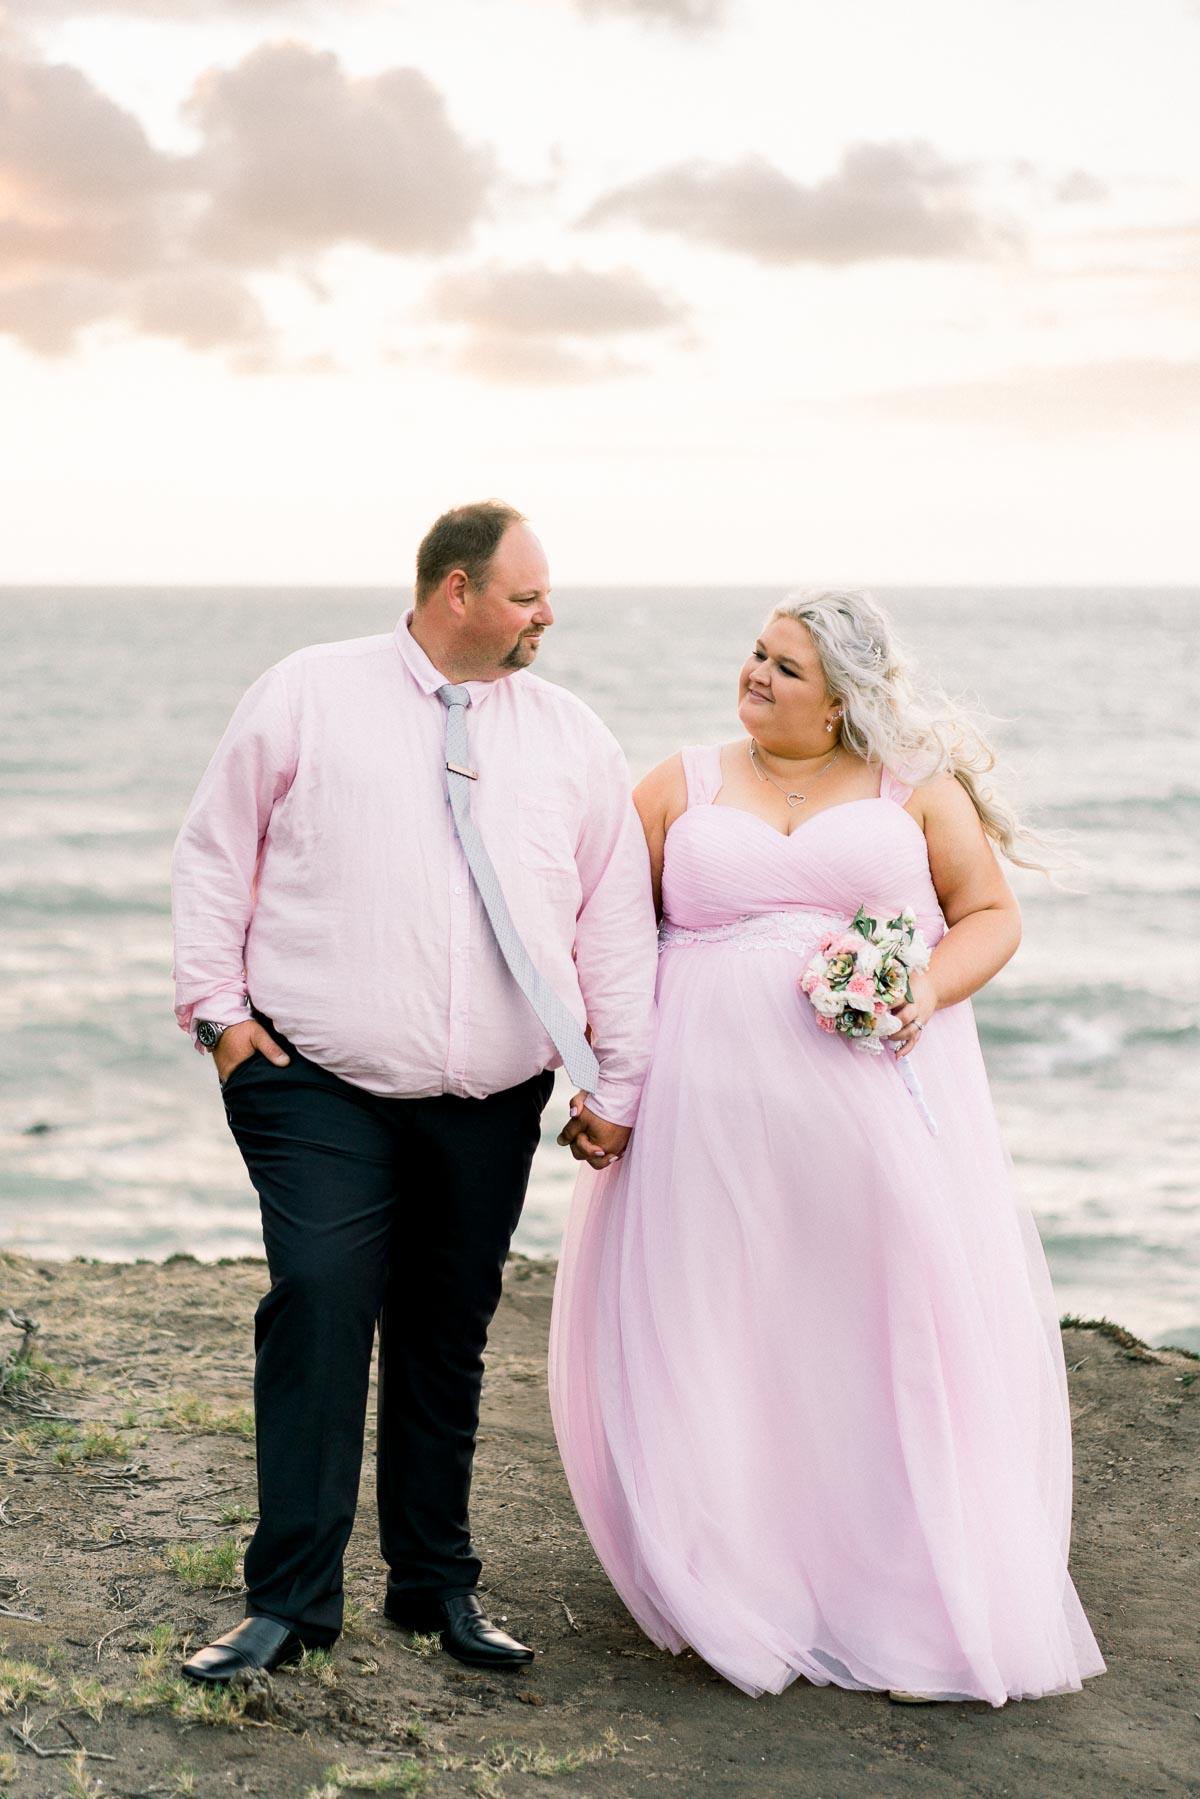 mt-eliza-mornington-peninsula-backyard-wedding-heart+soul-weddings-allison-matt-04145.jpg